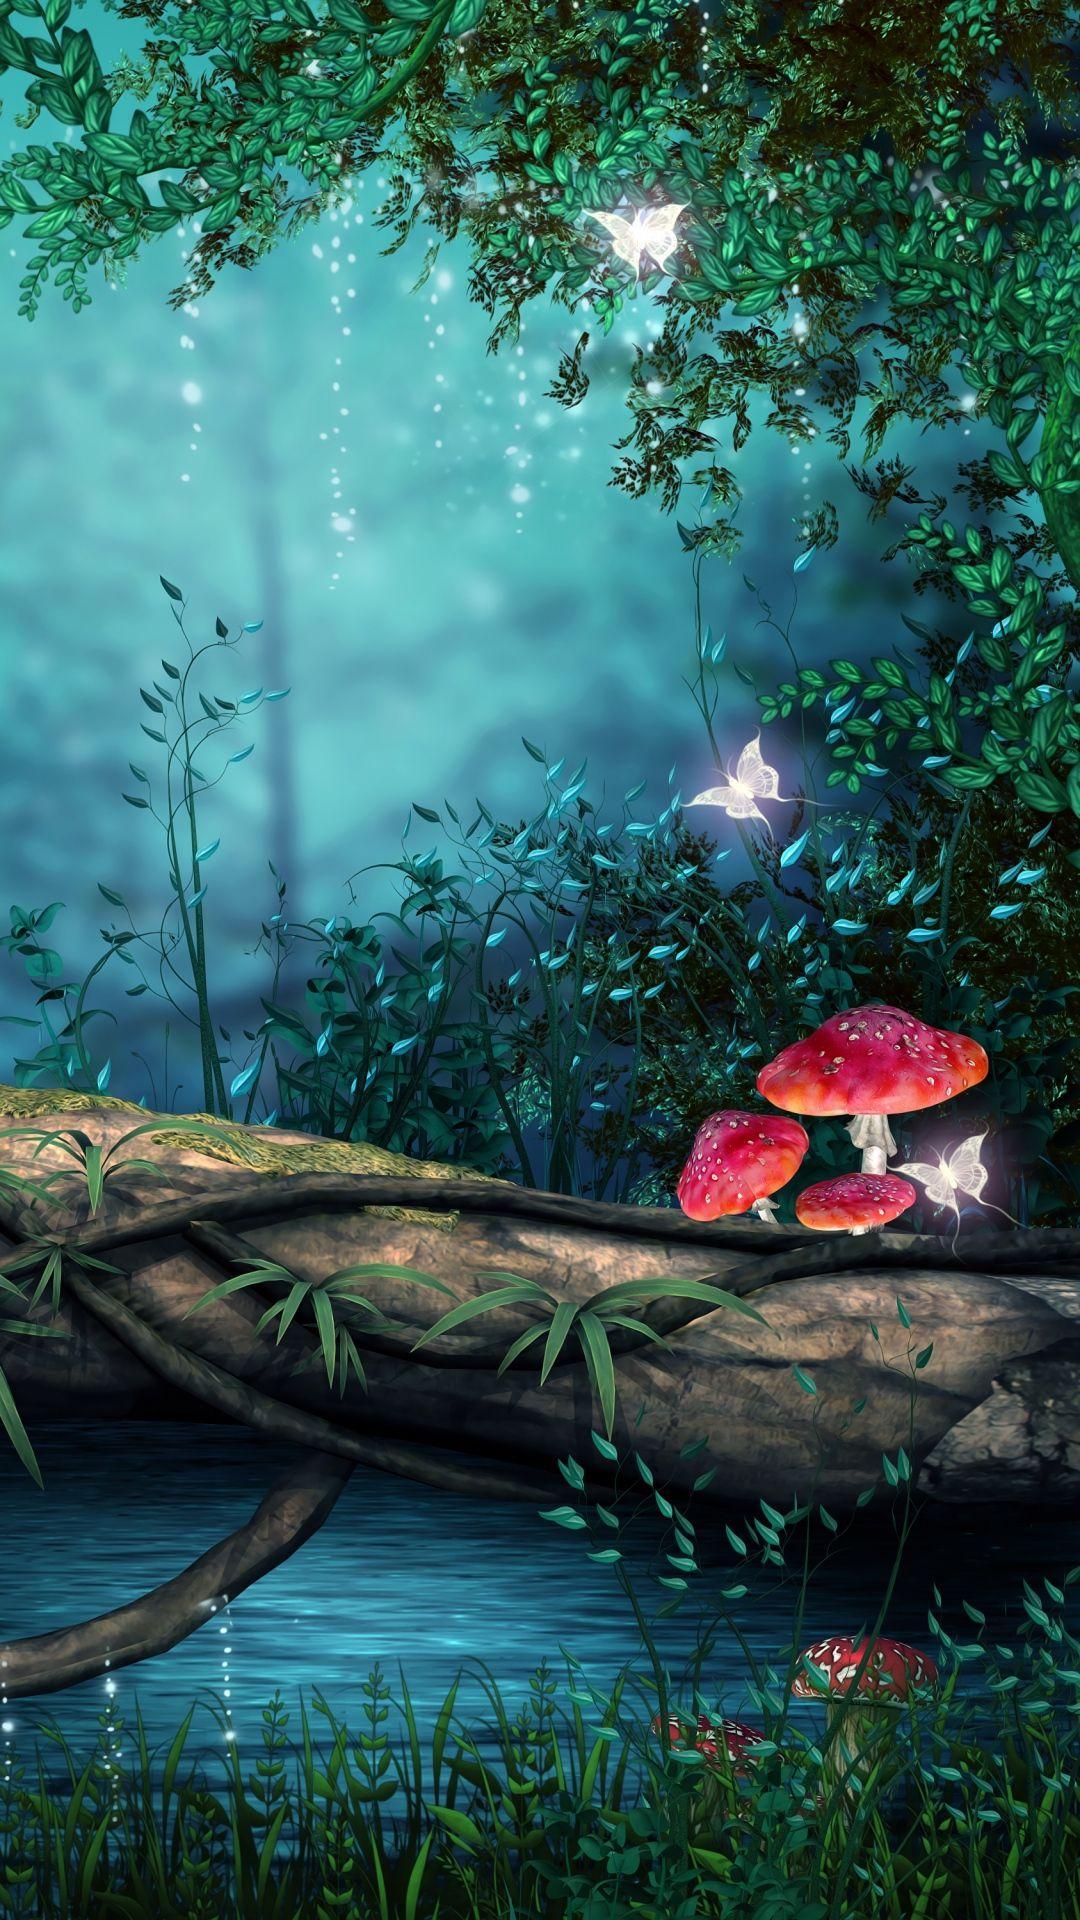 HD Nature Phone Wallpapers - Top Free HD Nature Phone